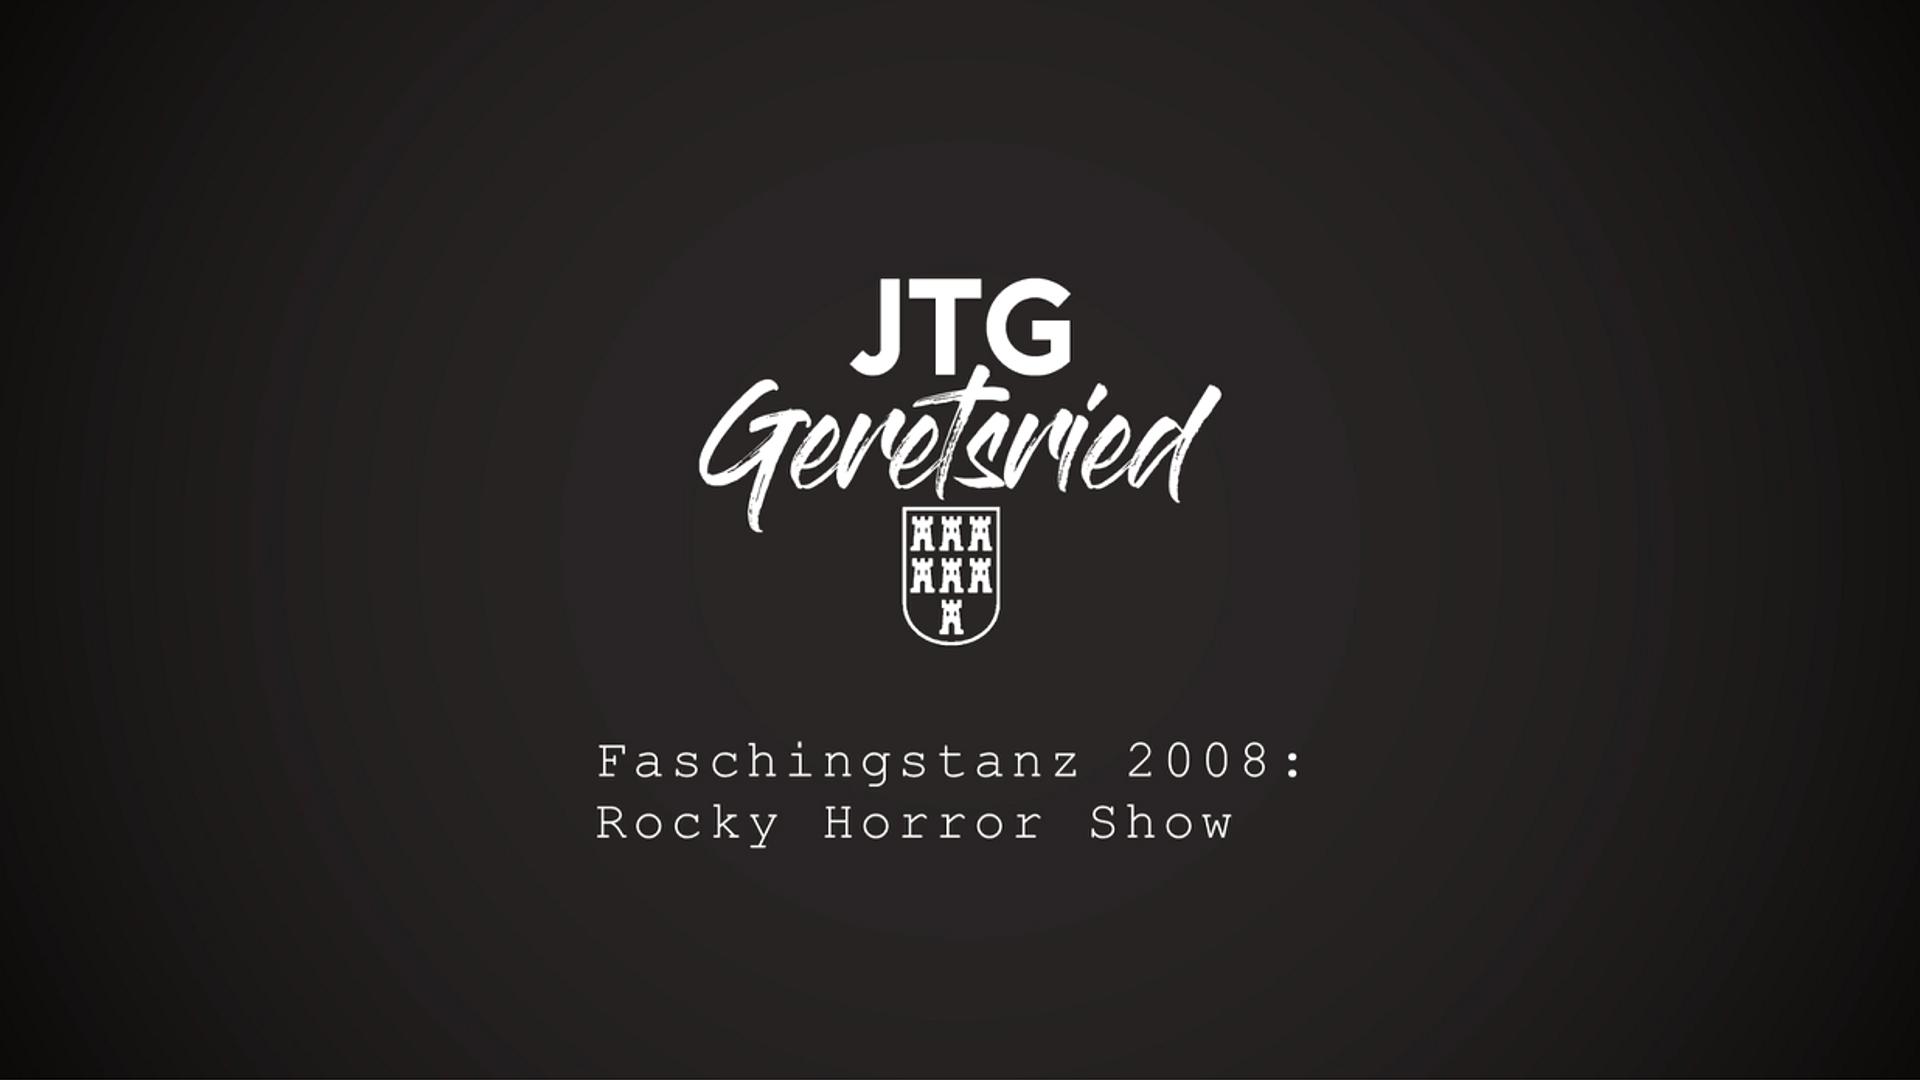 Faschingstanz 2008: Rocky Horror Show